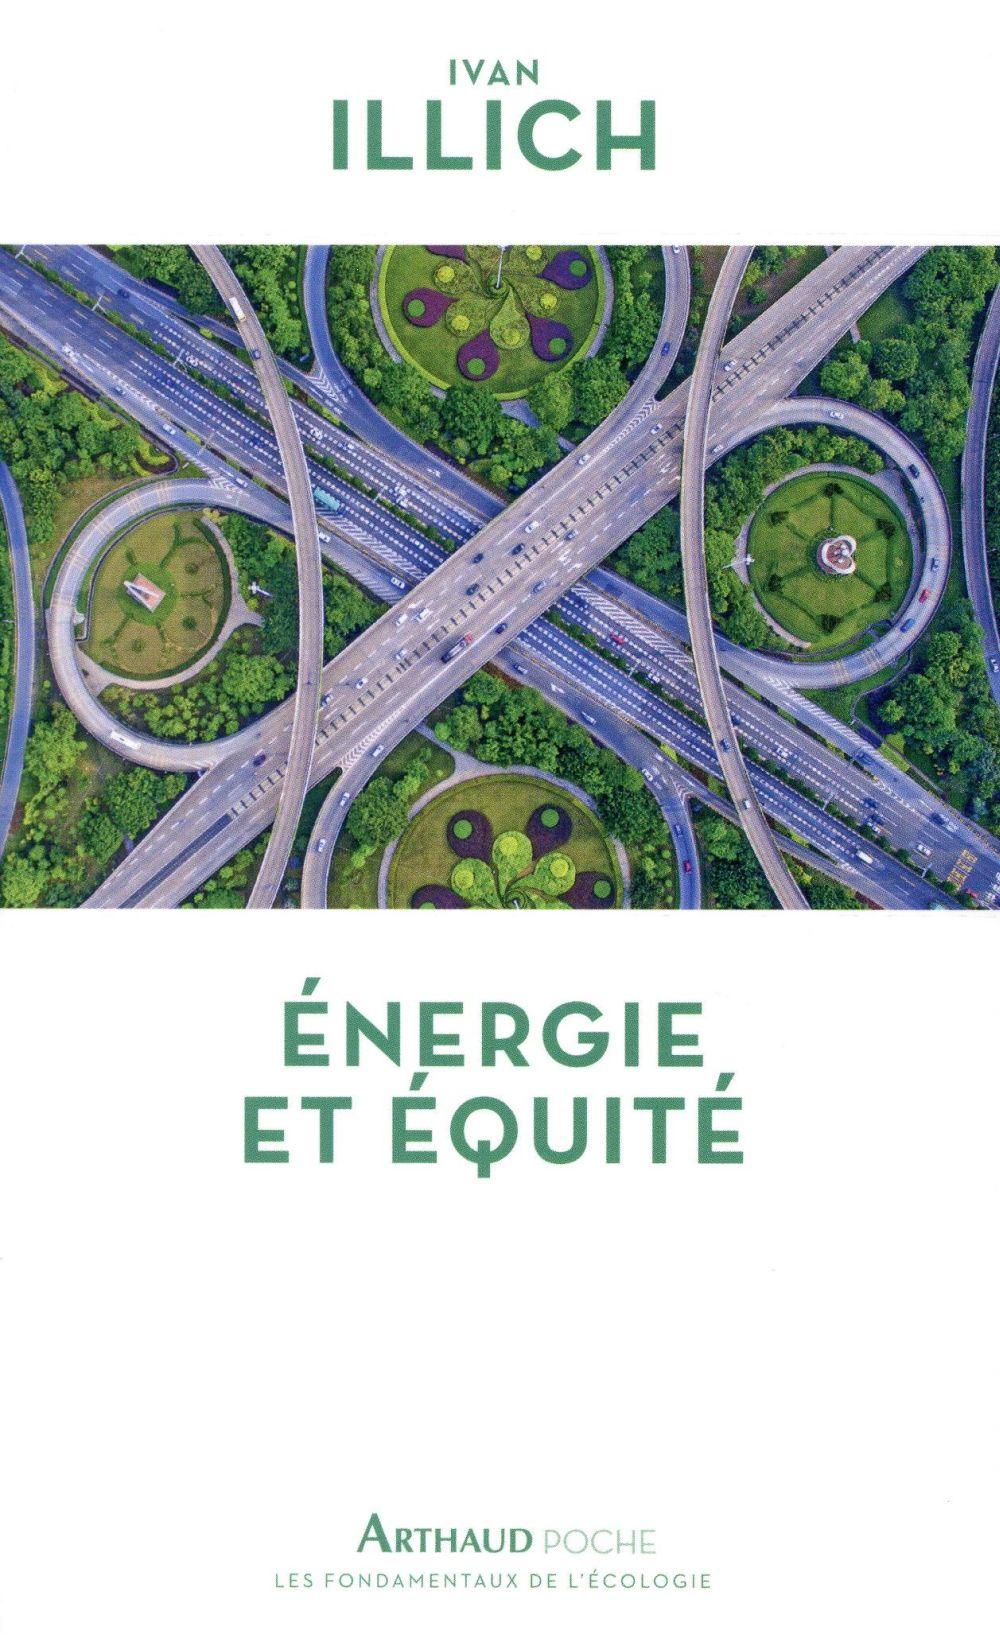 ENERGIE ET EQUITE ILLICH IVAN ARTHAUD